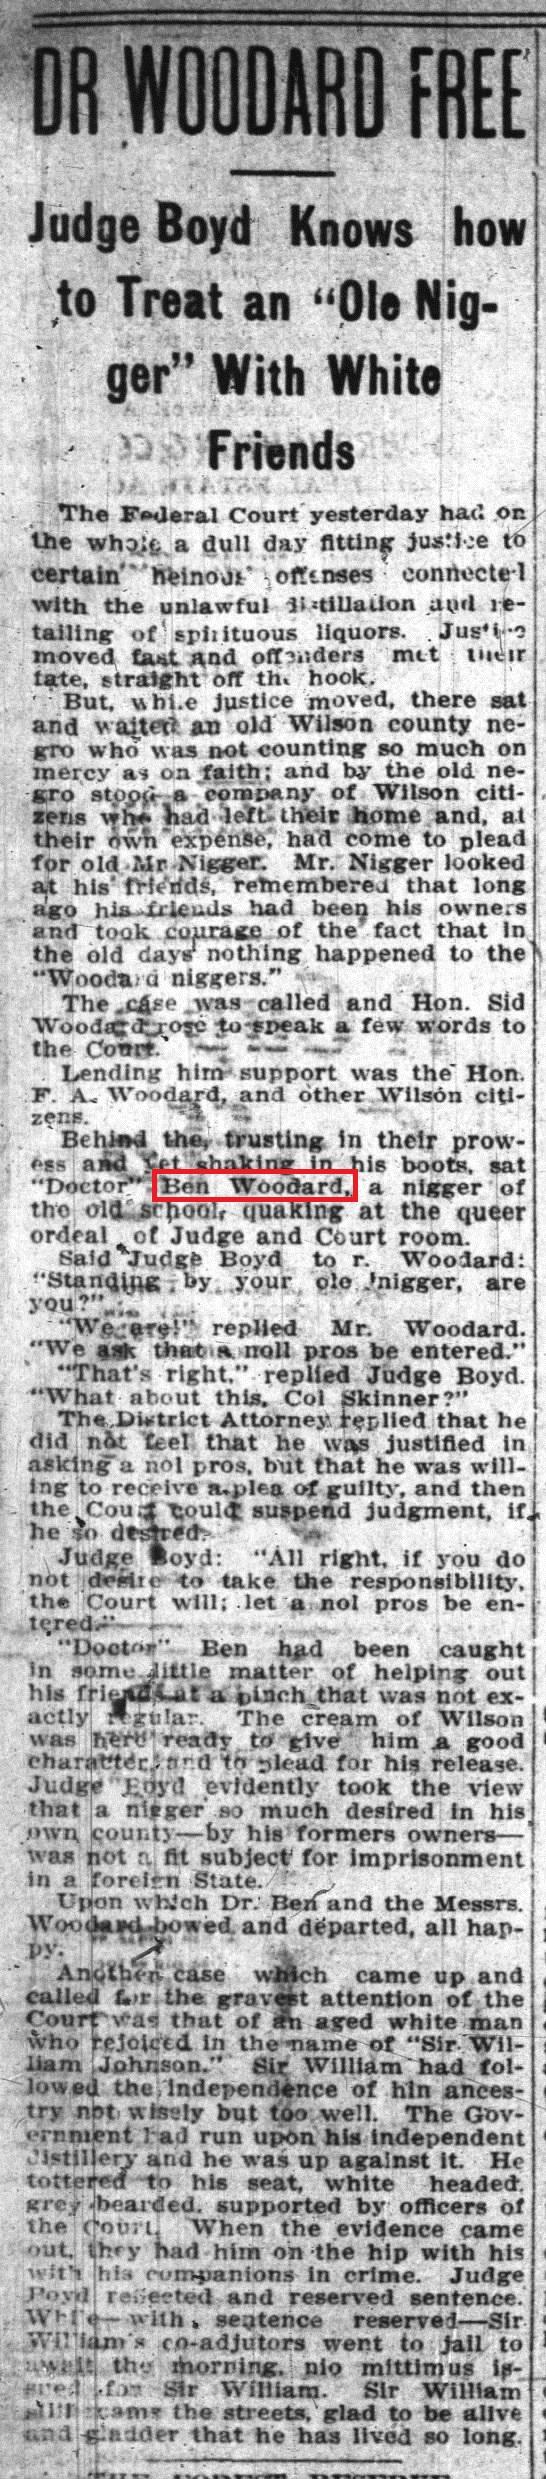 b Woodard 1 31 1908